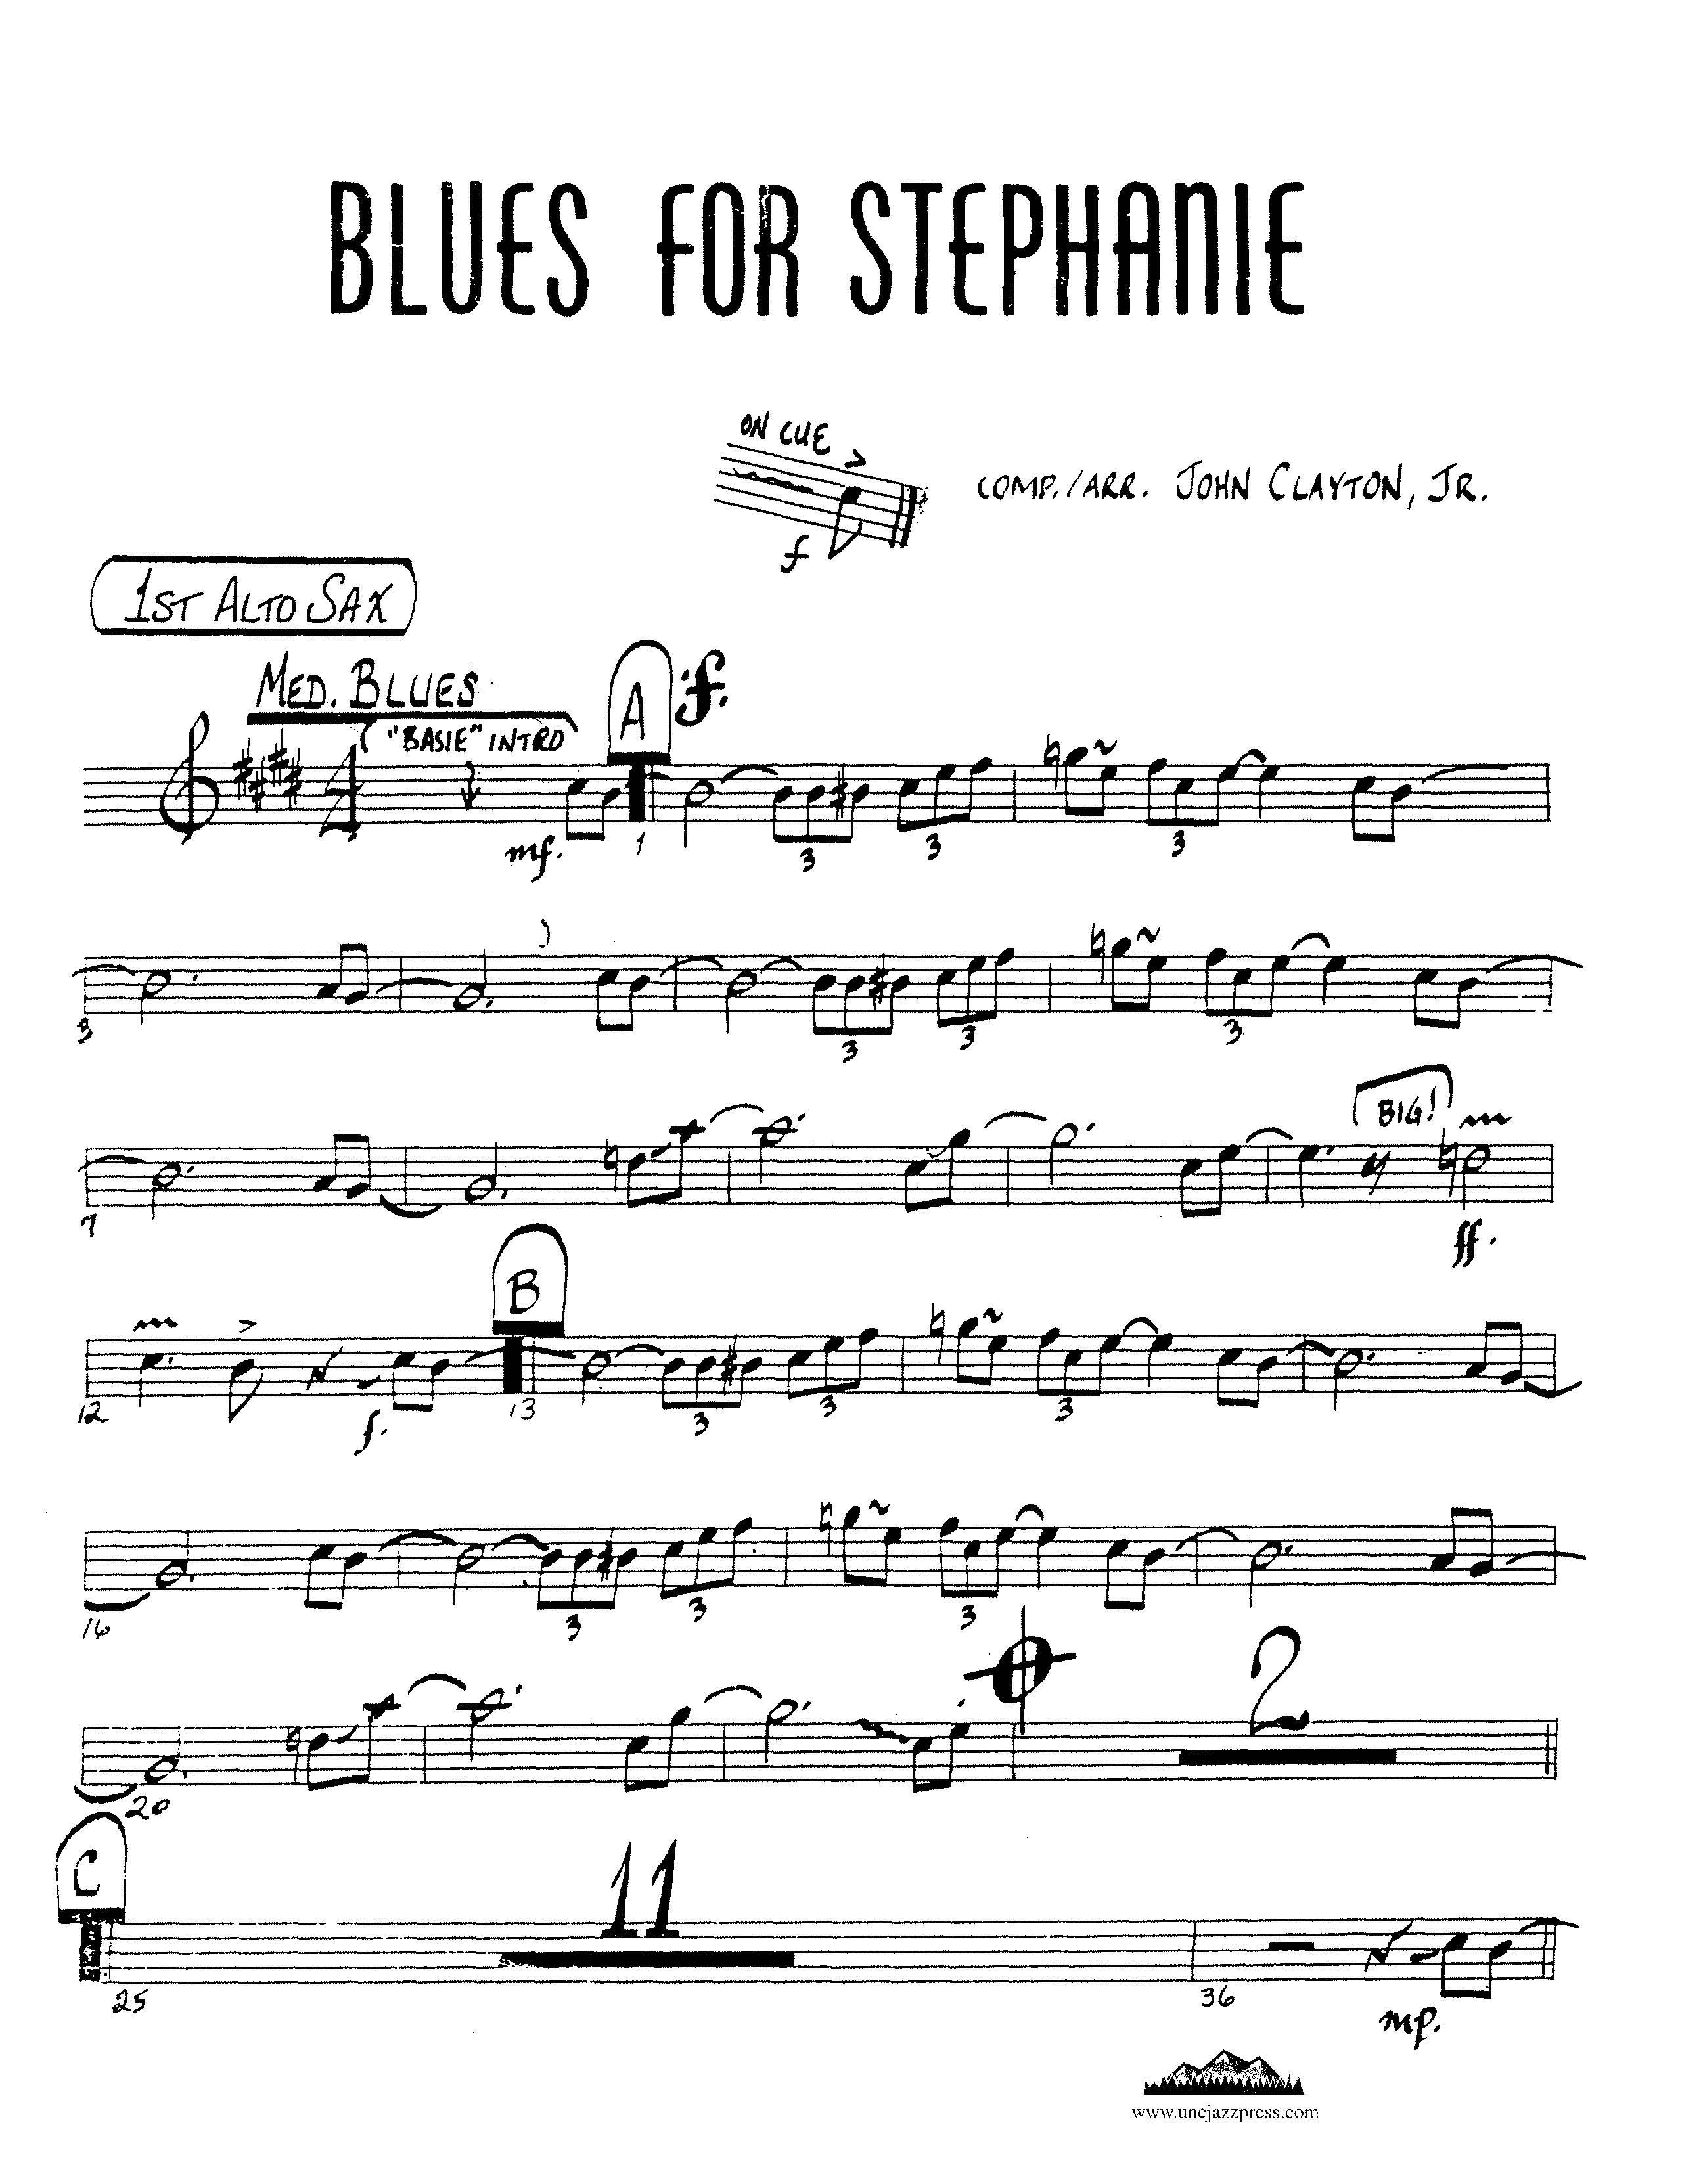 Browse charts by Style: Blues-Medium, UNC Jazz Press, jazz charts